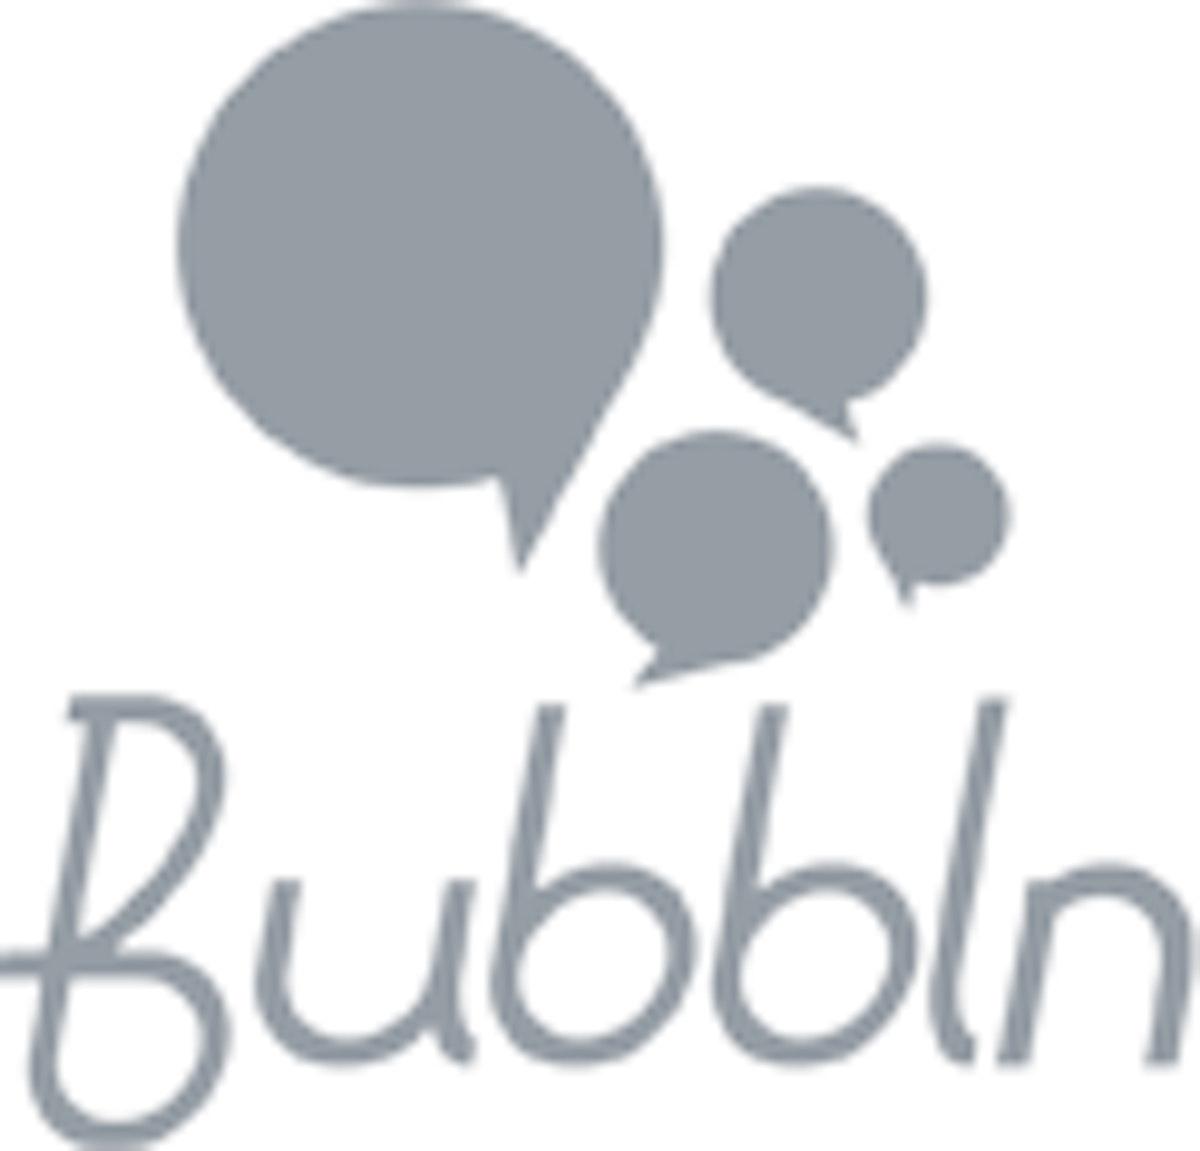 bubbln1.png